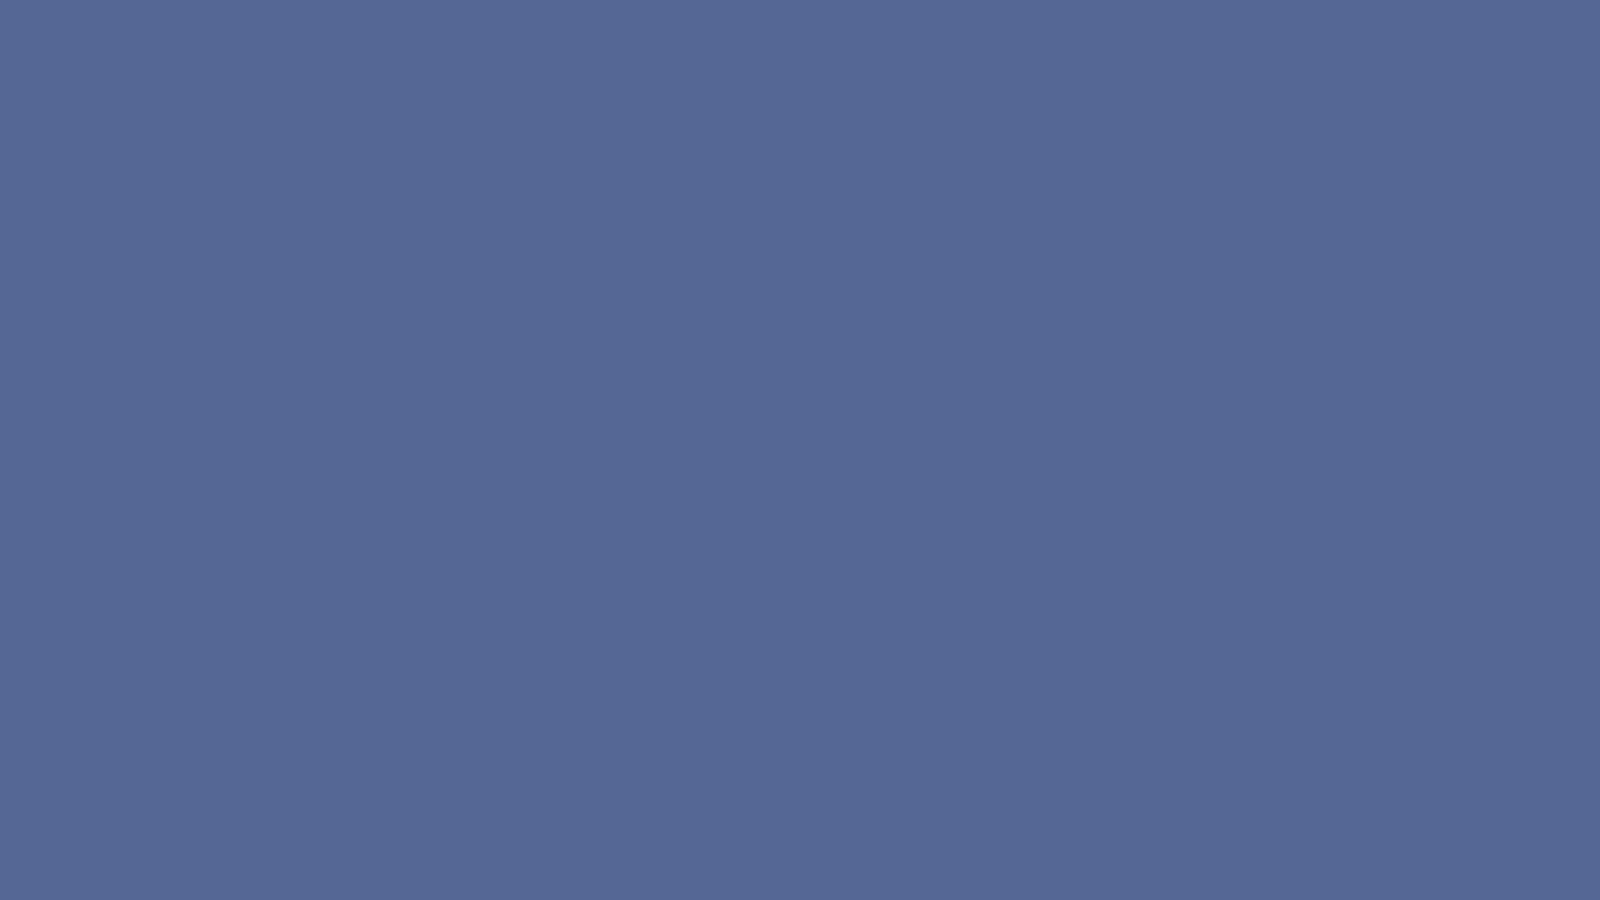 1600x900 UCLA Blue Solid Color Background